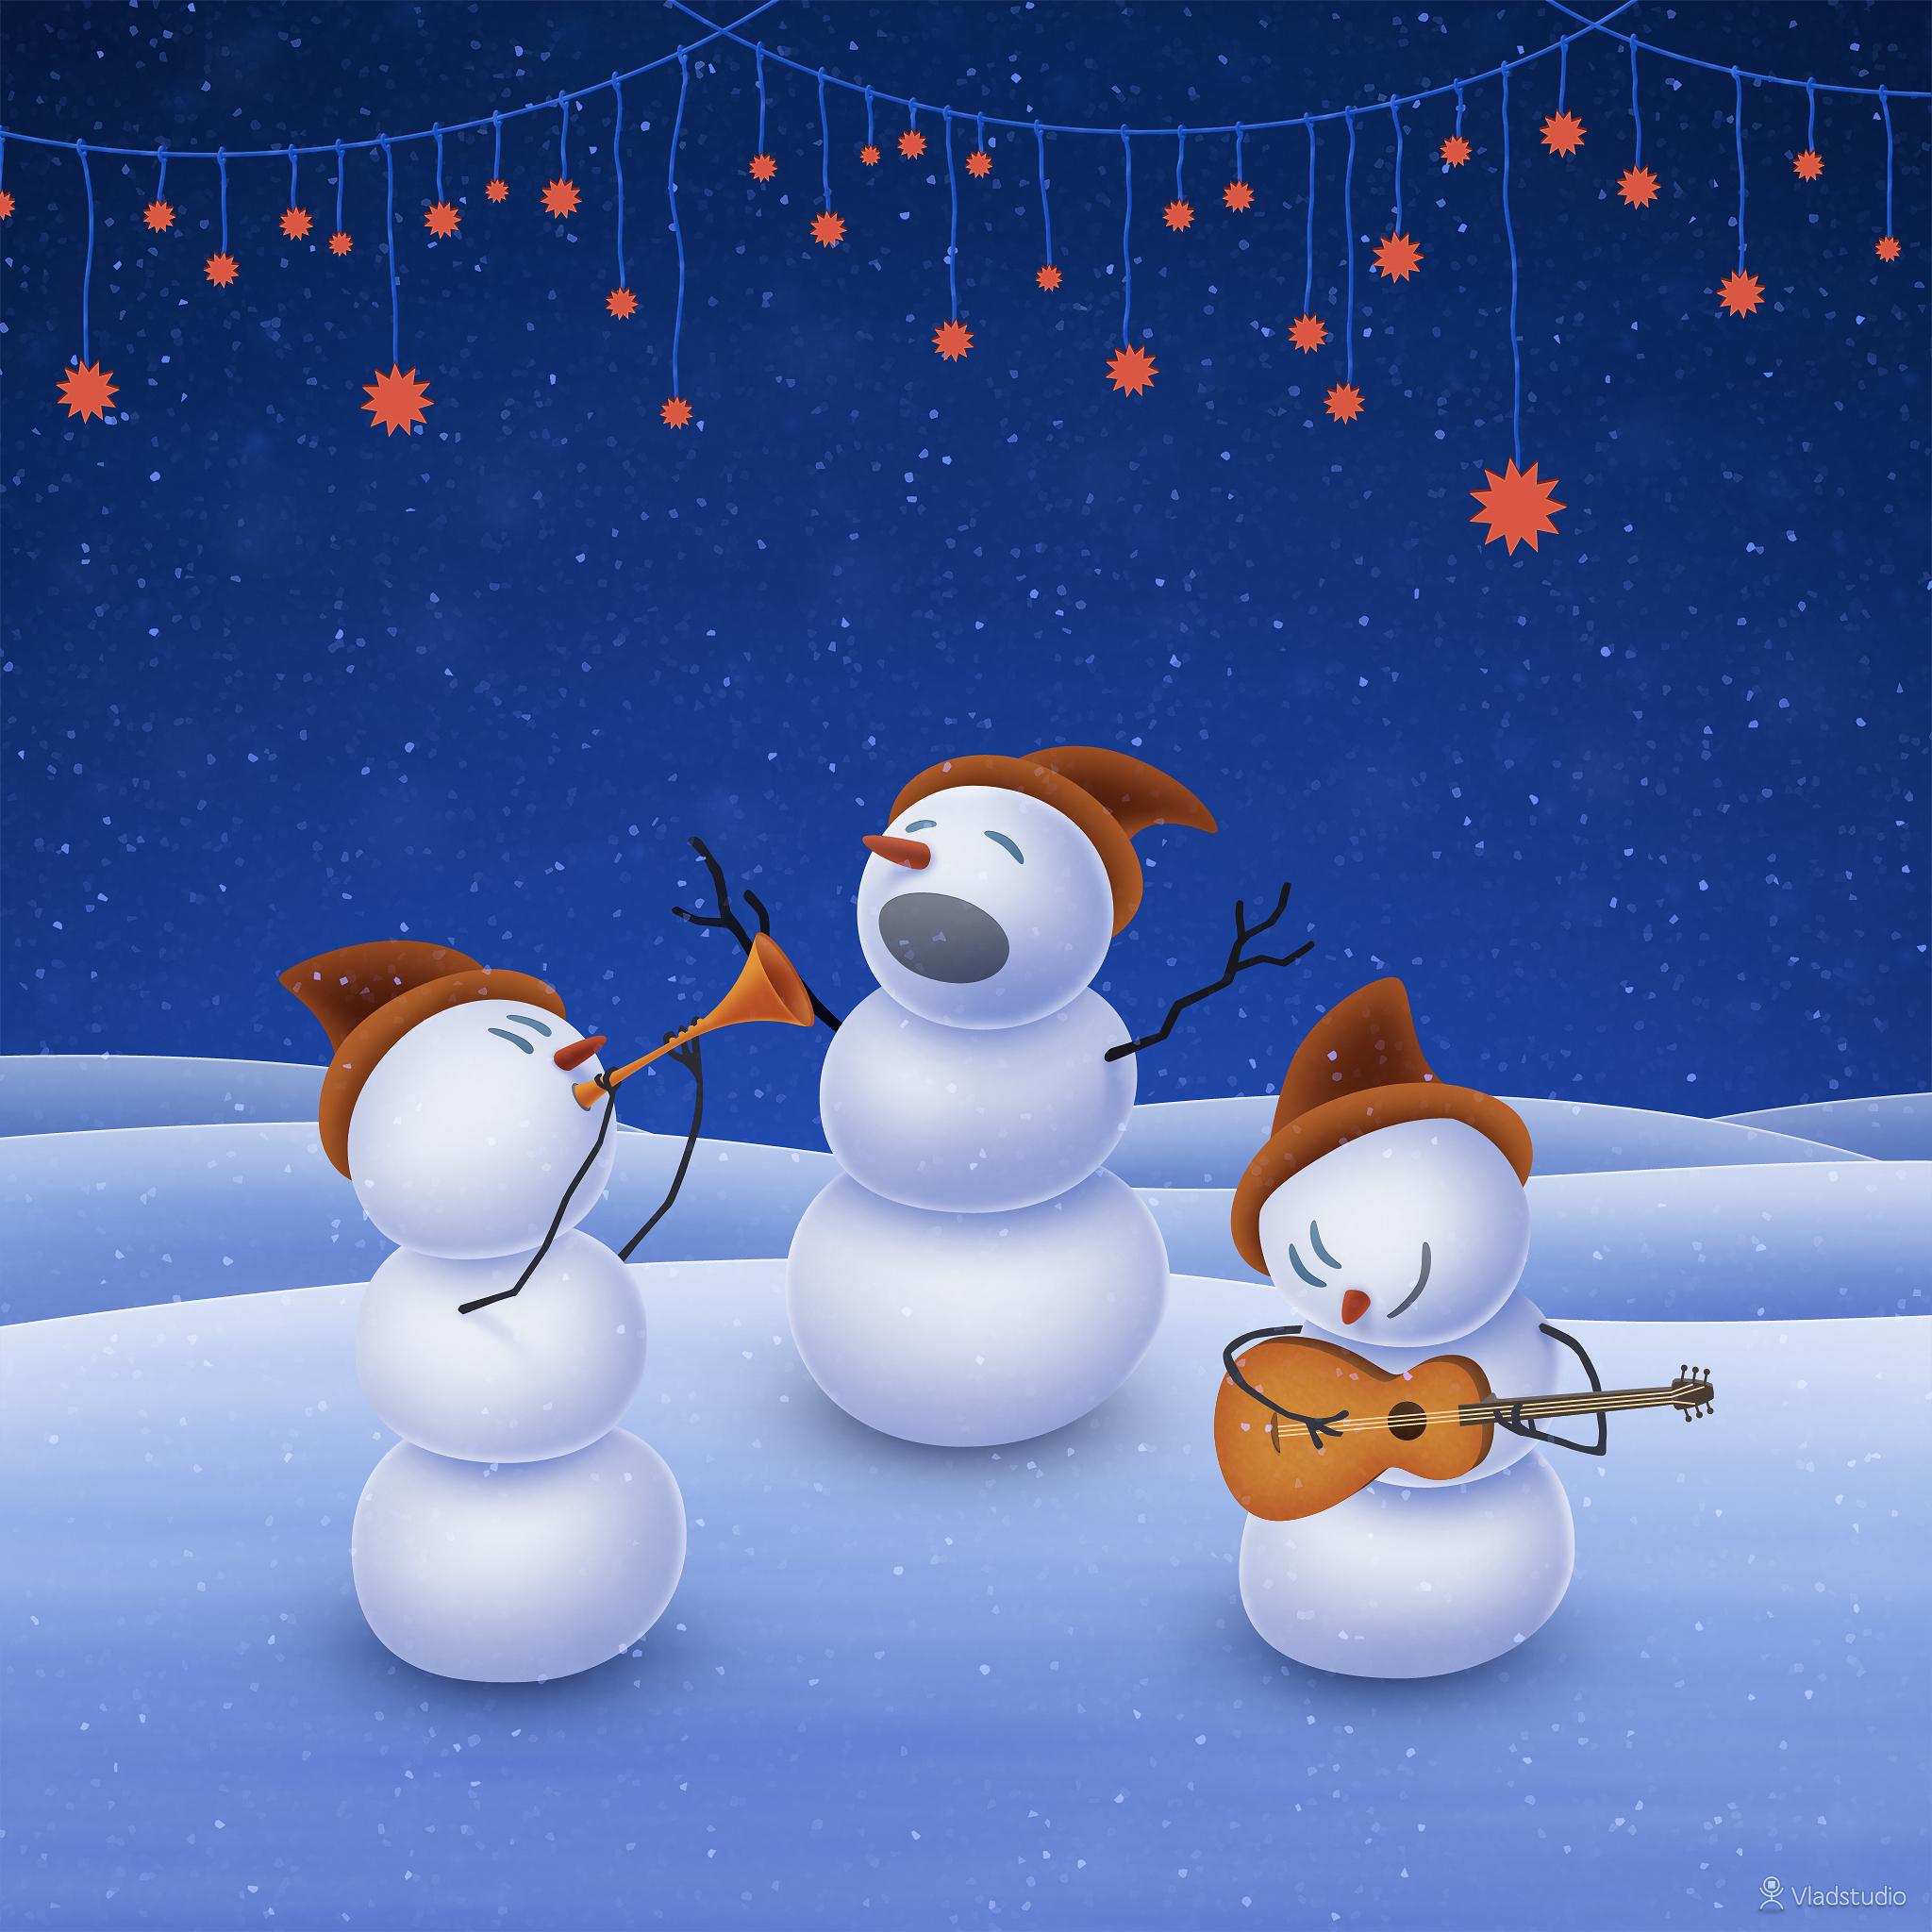 Singing-Snowman